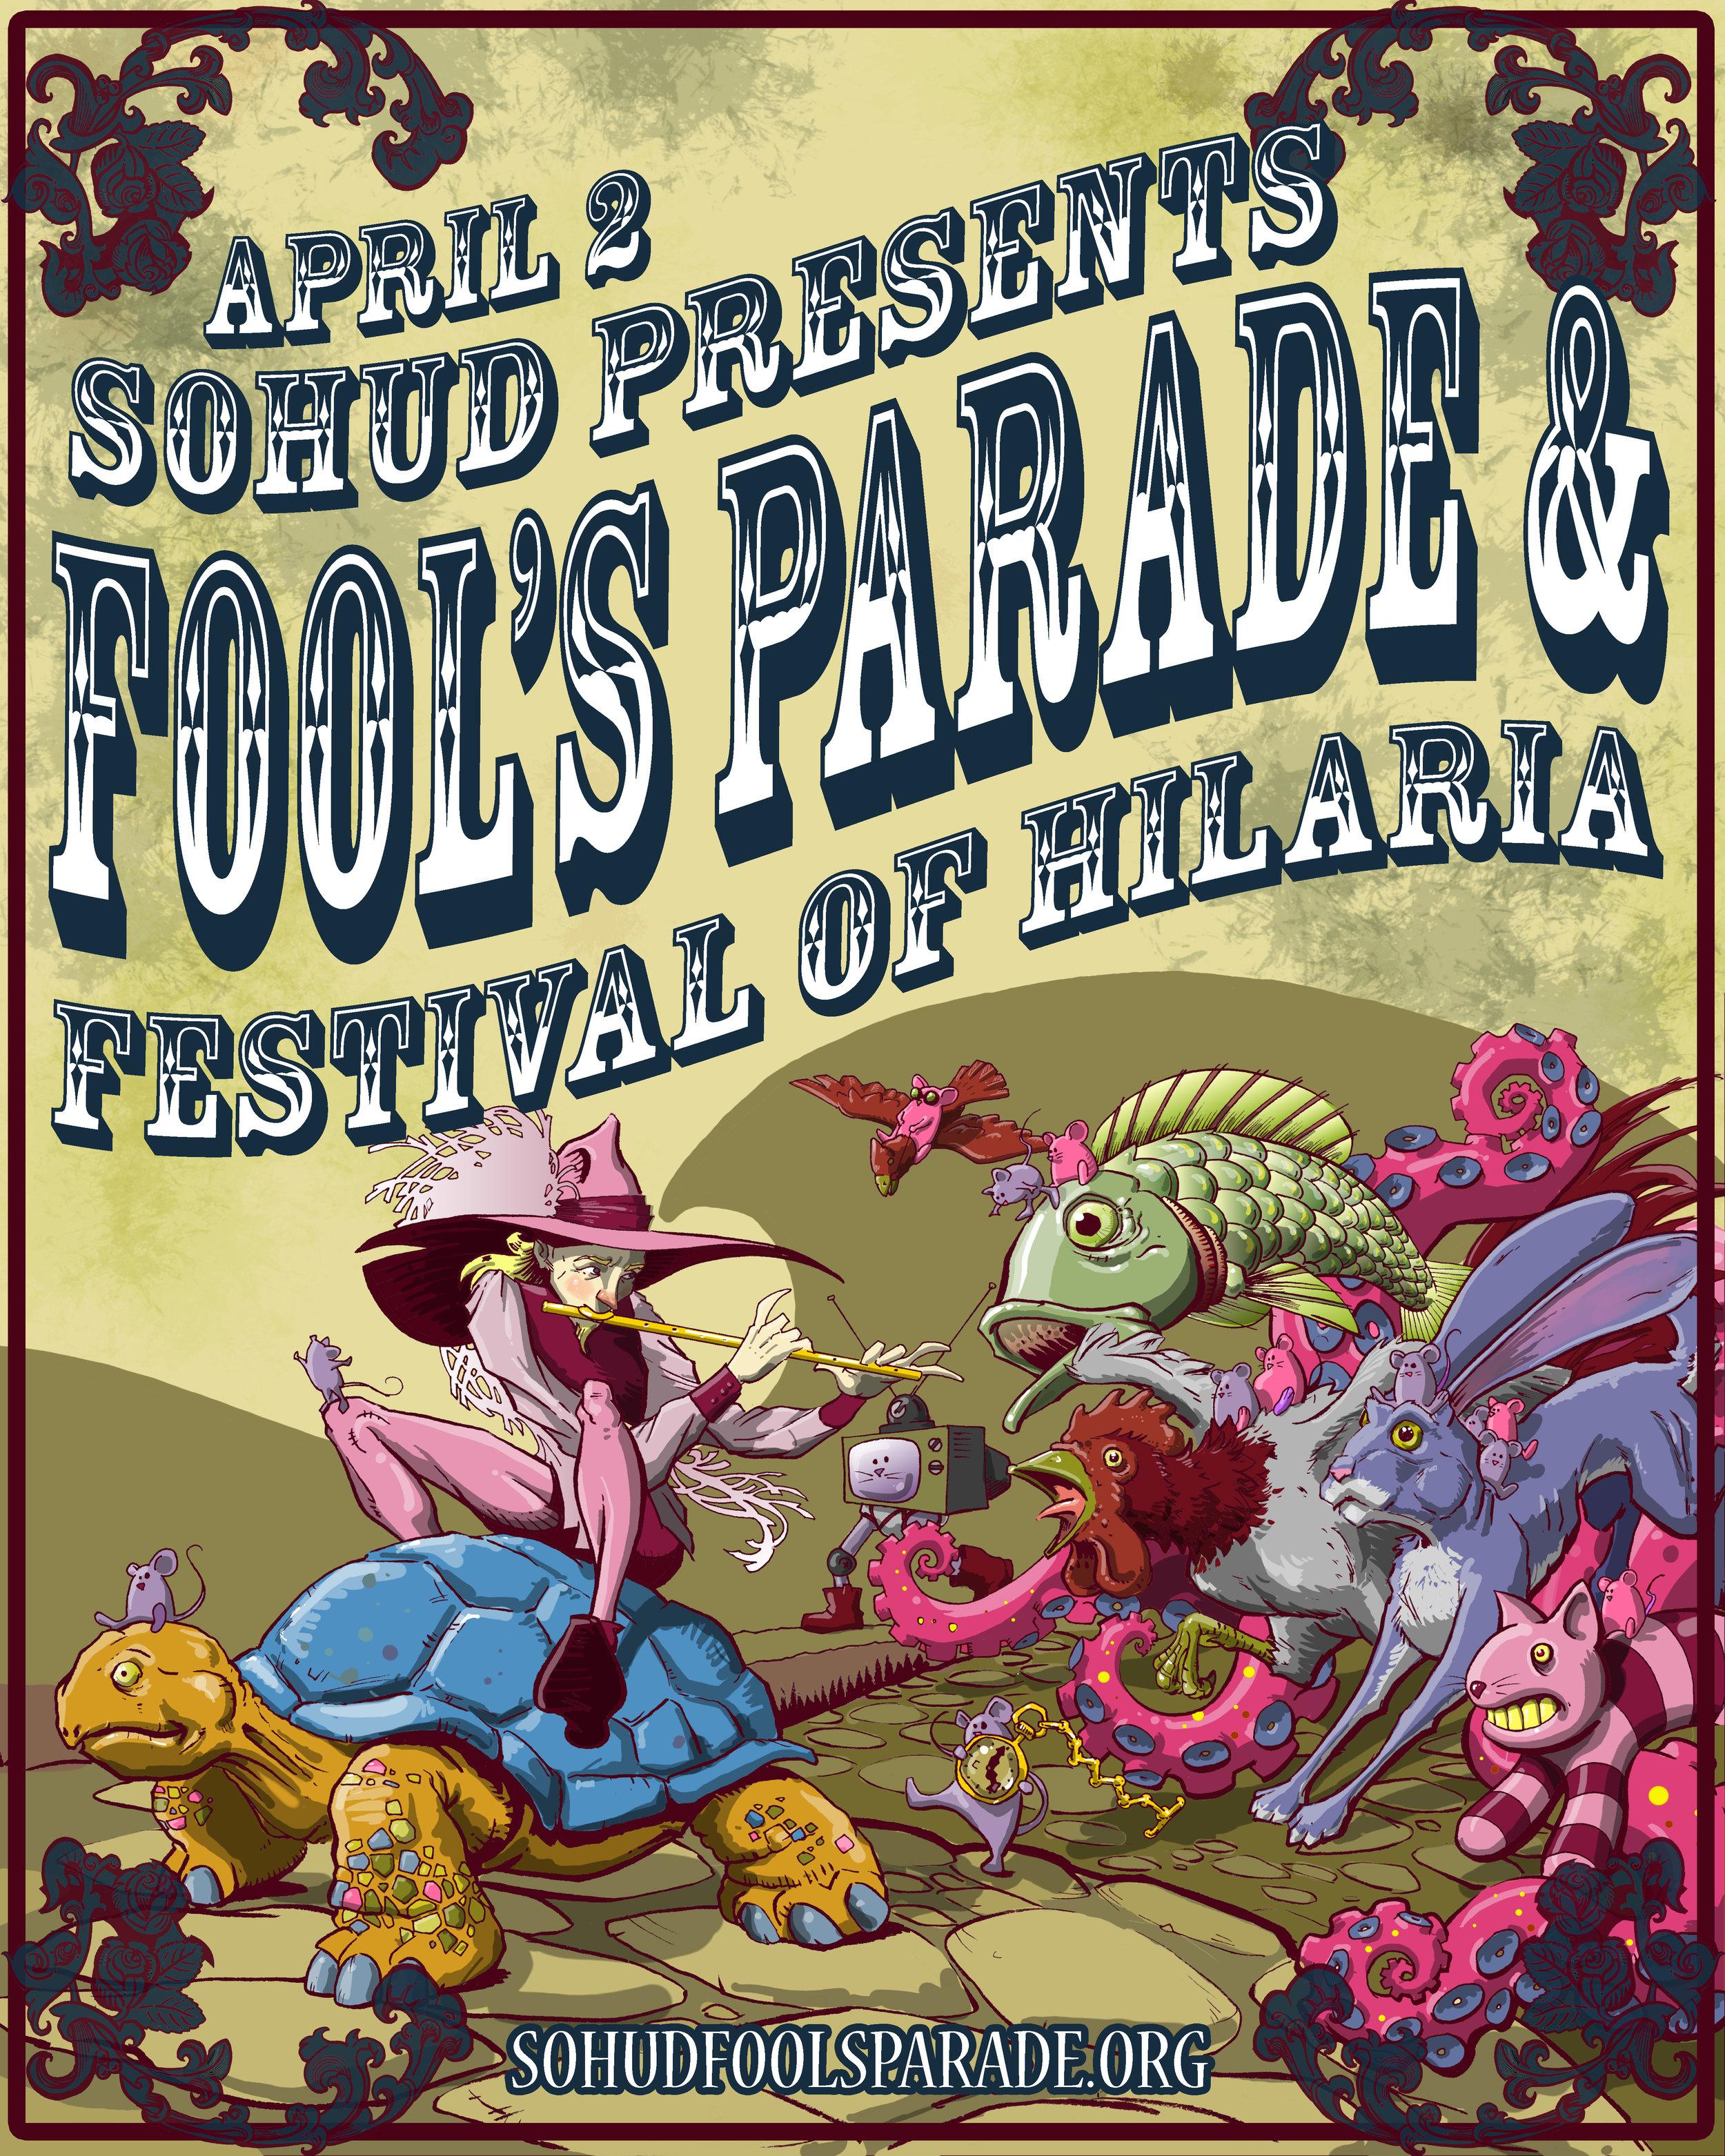 Fools Parade 2016 Poster.jpg